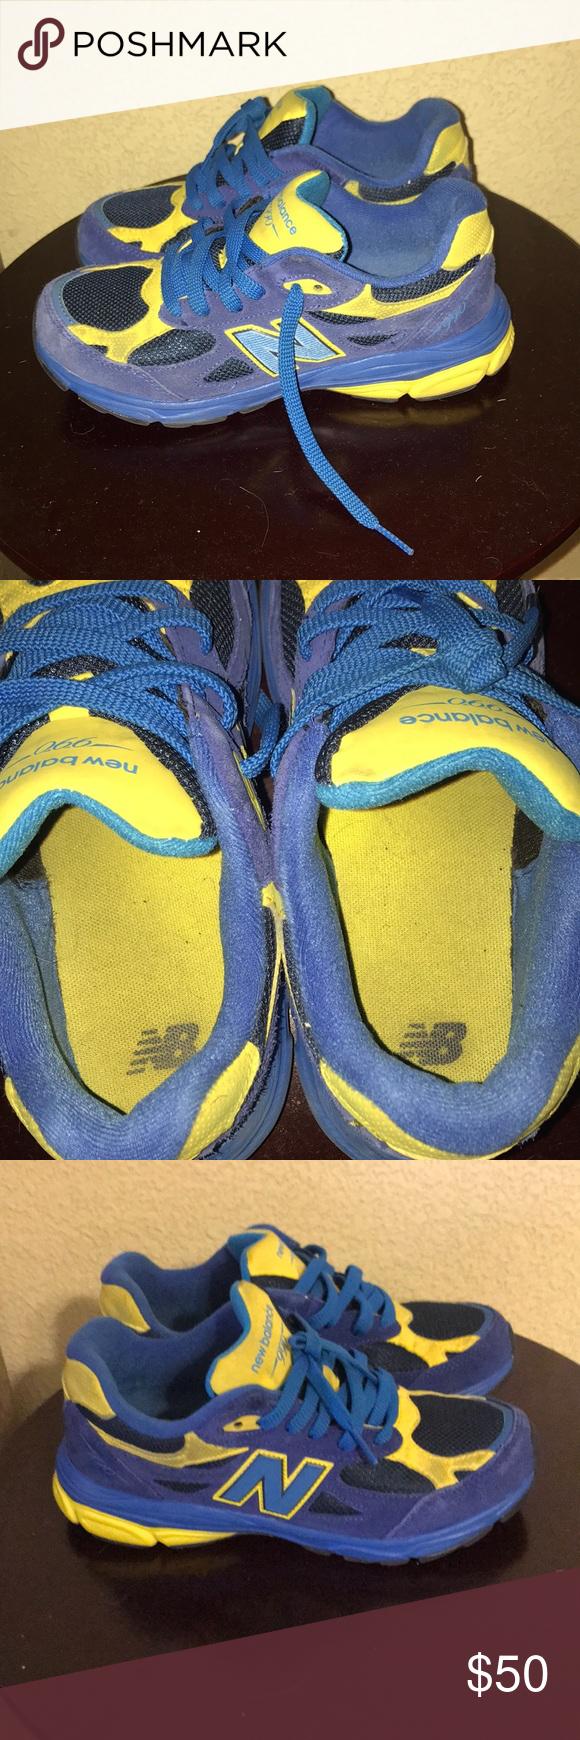 New balance shoes | New balance shoes